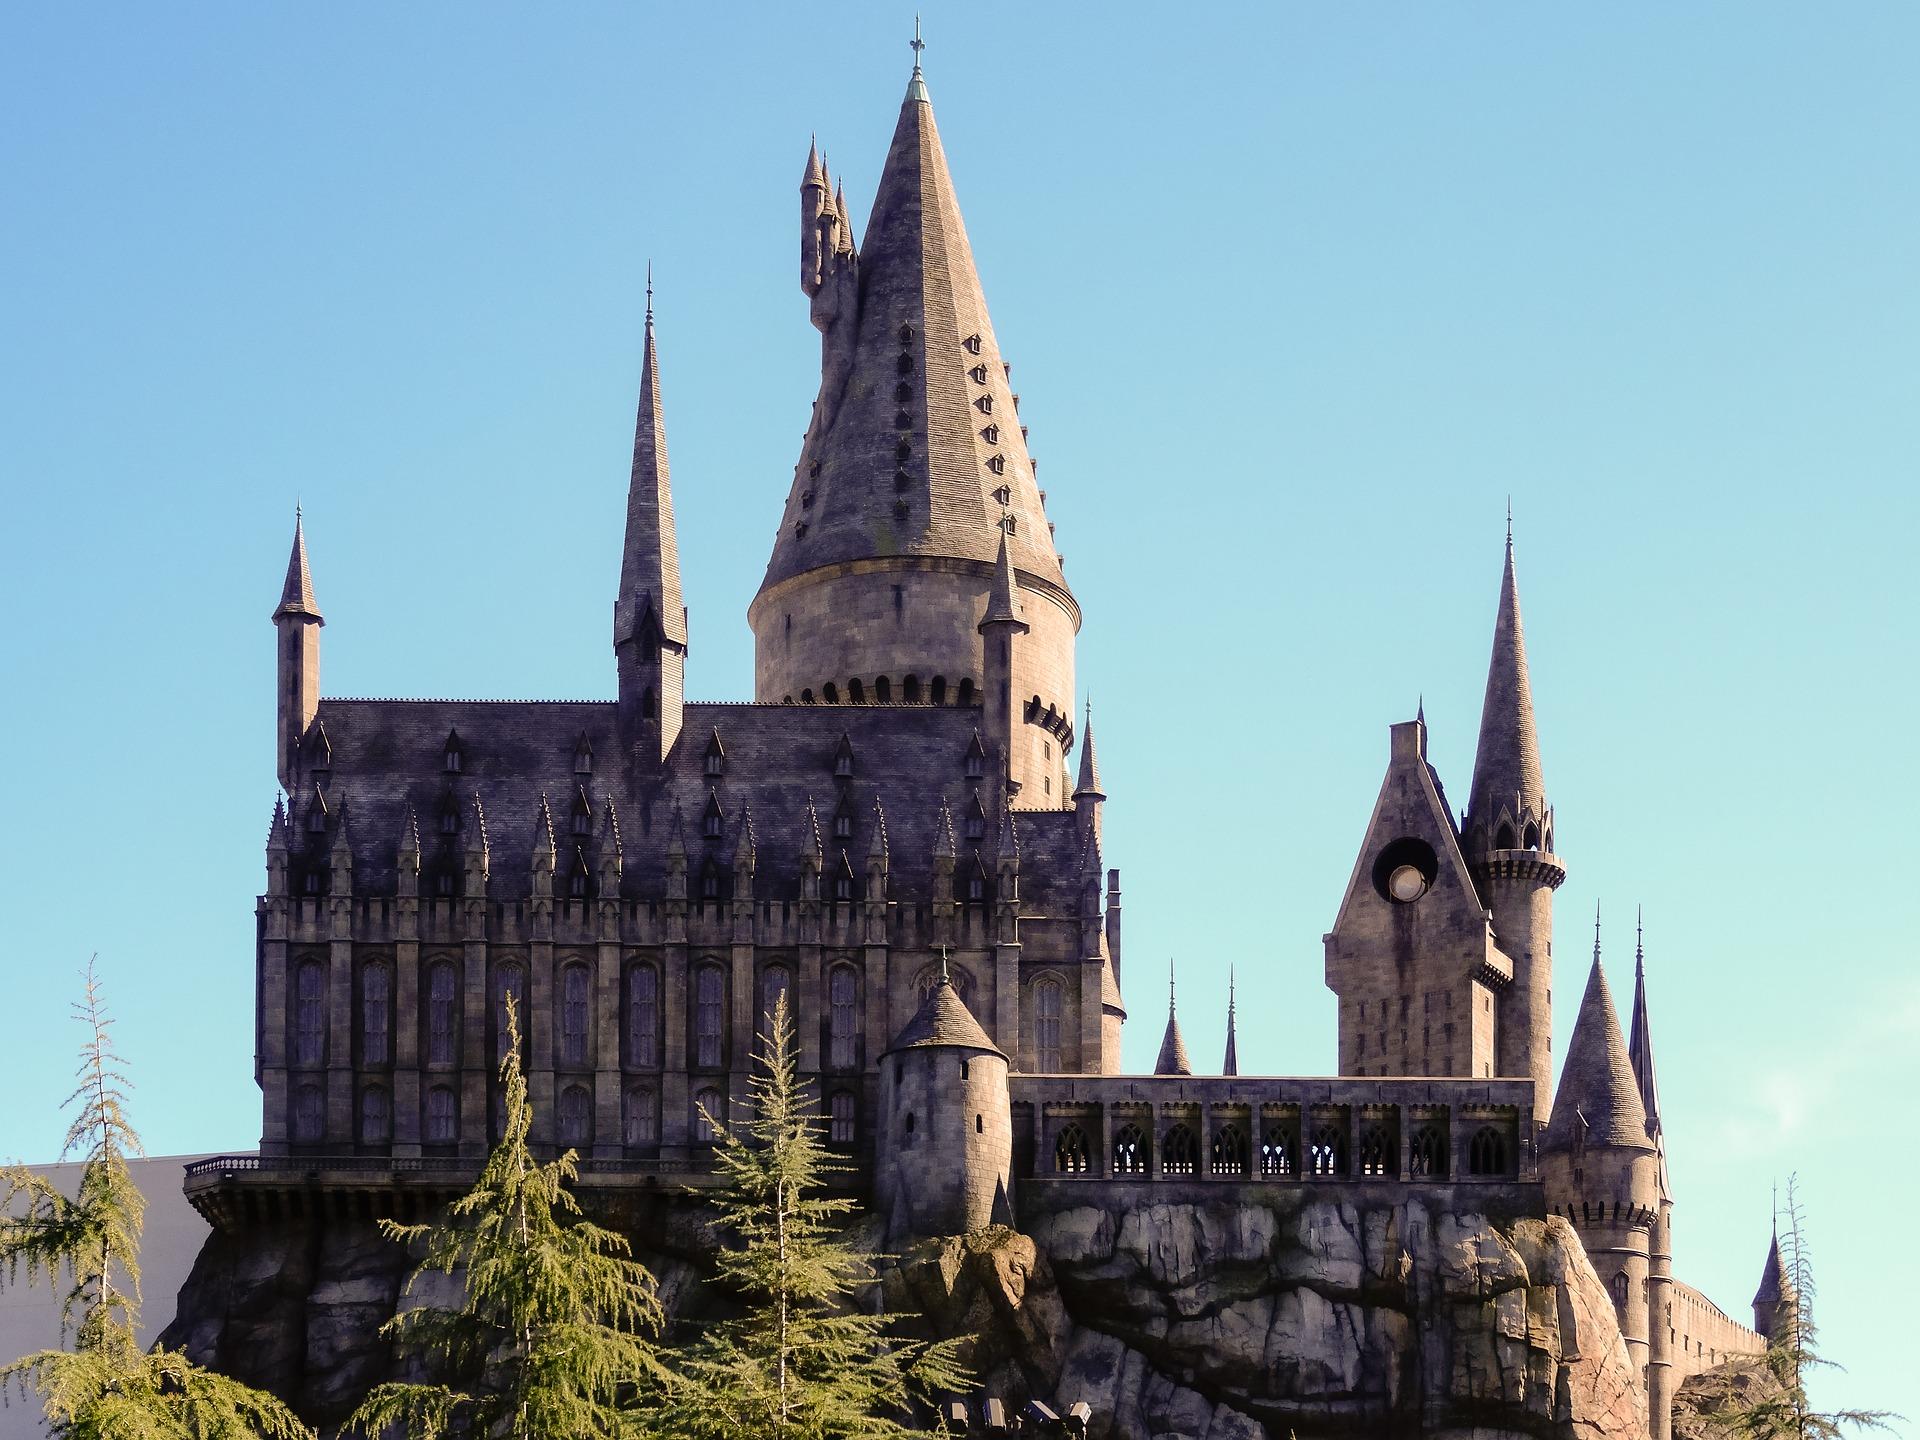 Tagesreise nach London - The Making of Harry Potter Hogwarts